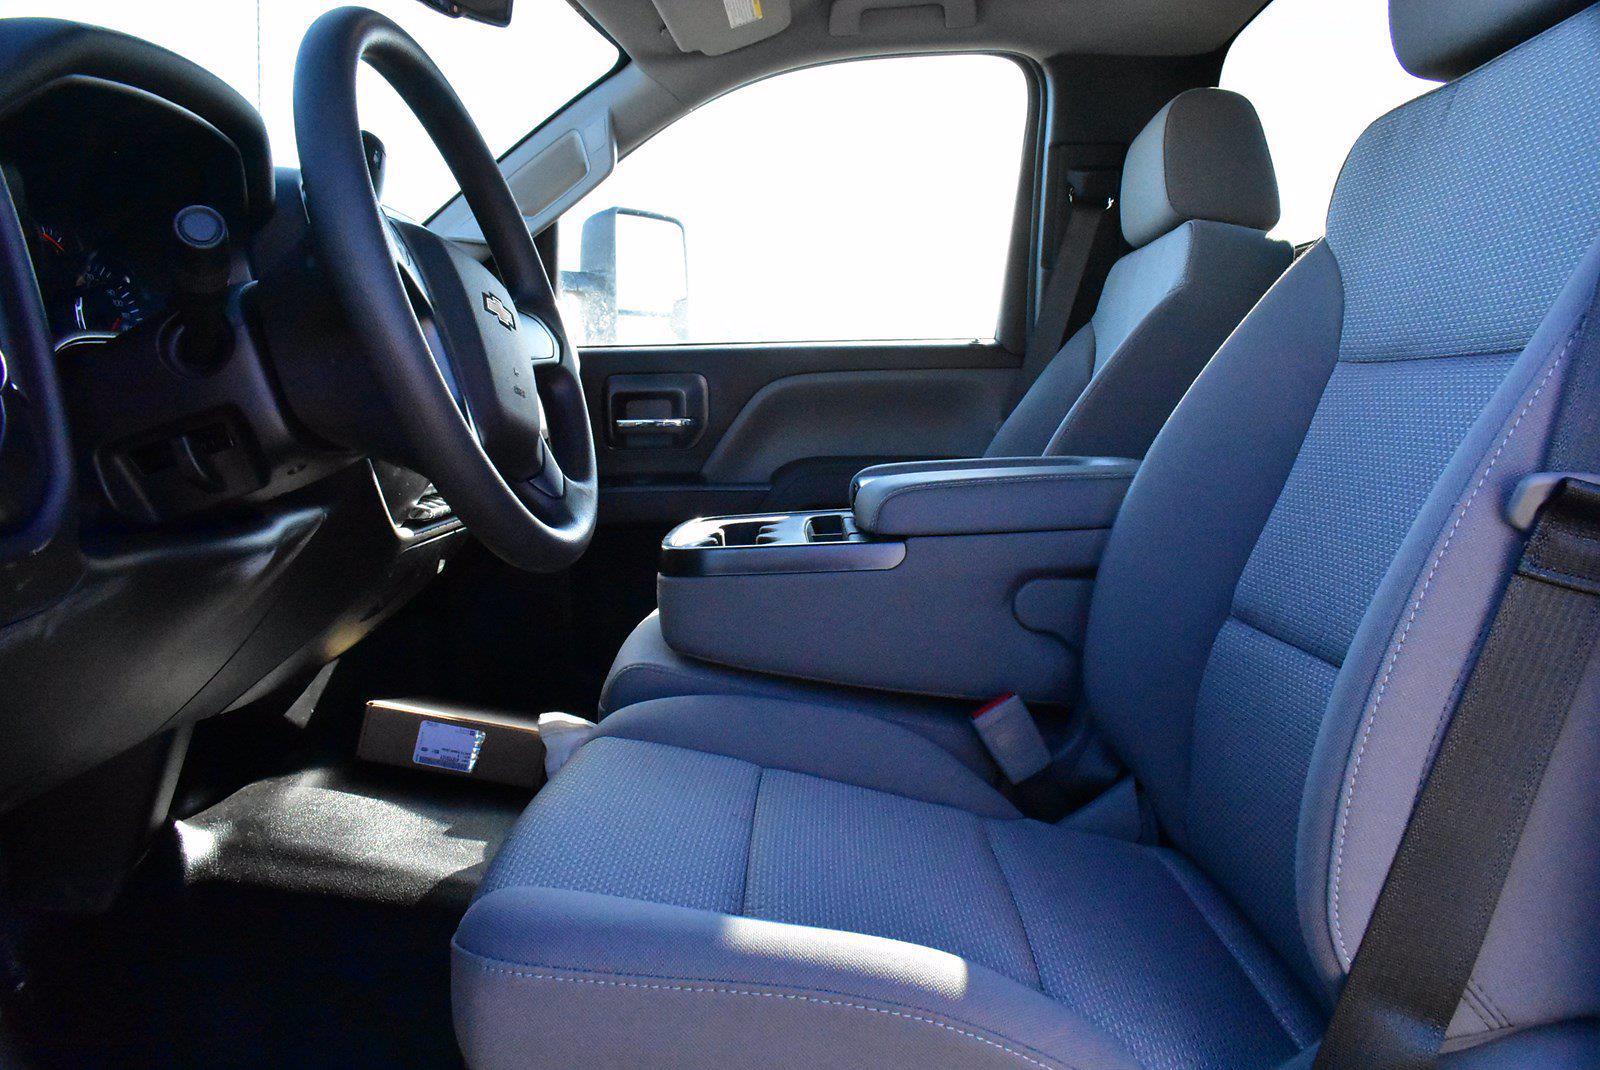 2020 Chevrolet Silverado 5500 DRW 4x2, Cab Chassis #D100222 - photo 4